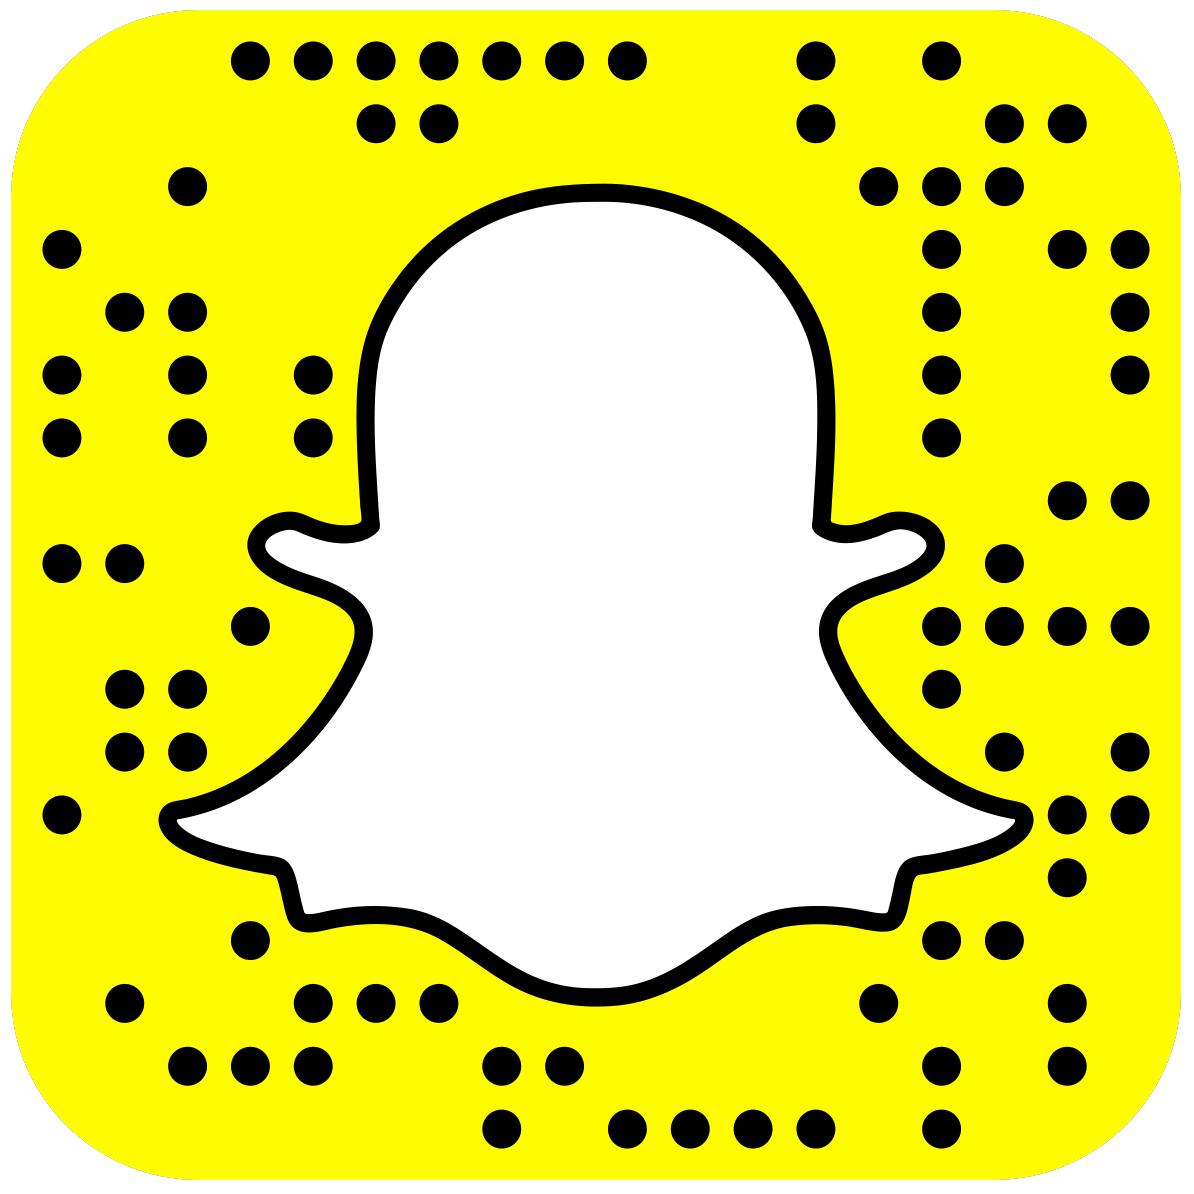 Julianne Hough Snapchat username